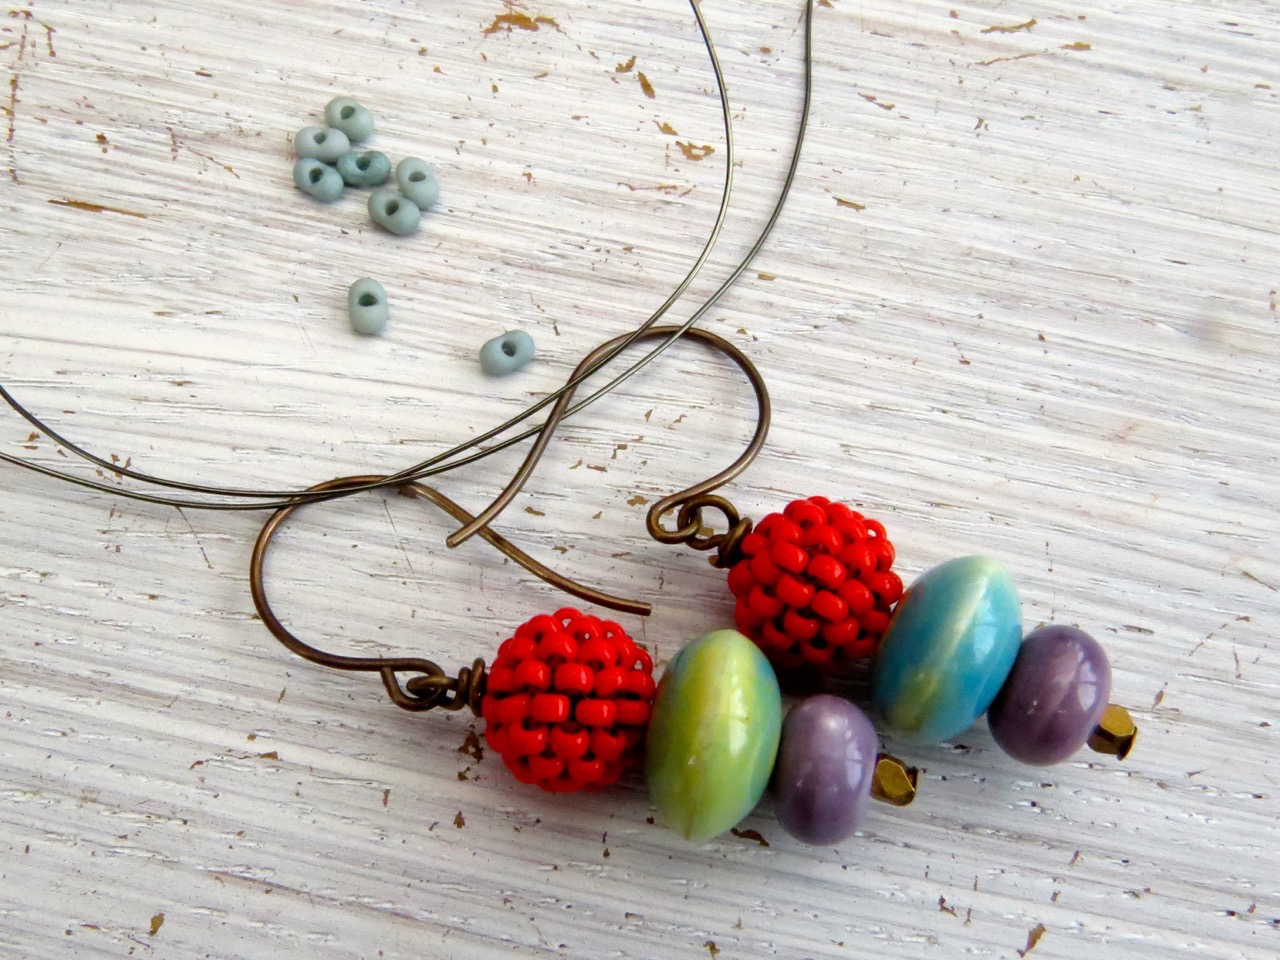 Ingredients for embellishing earwires